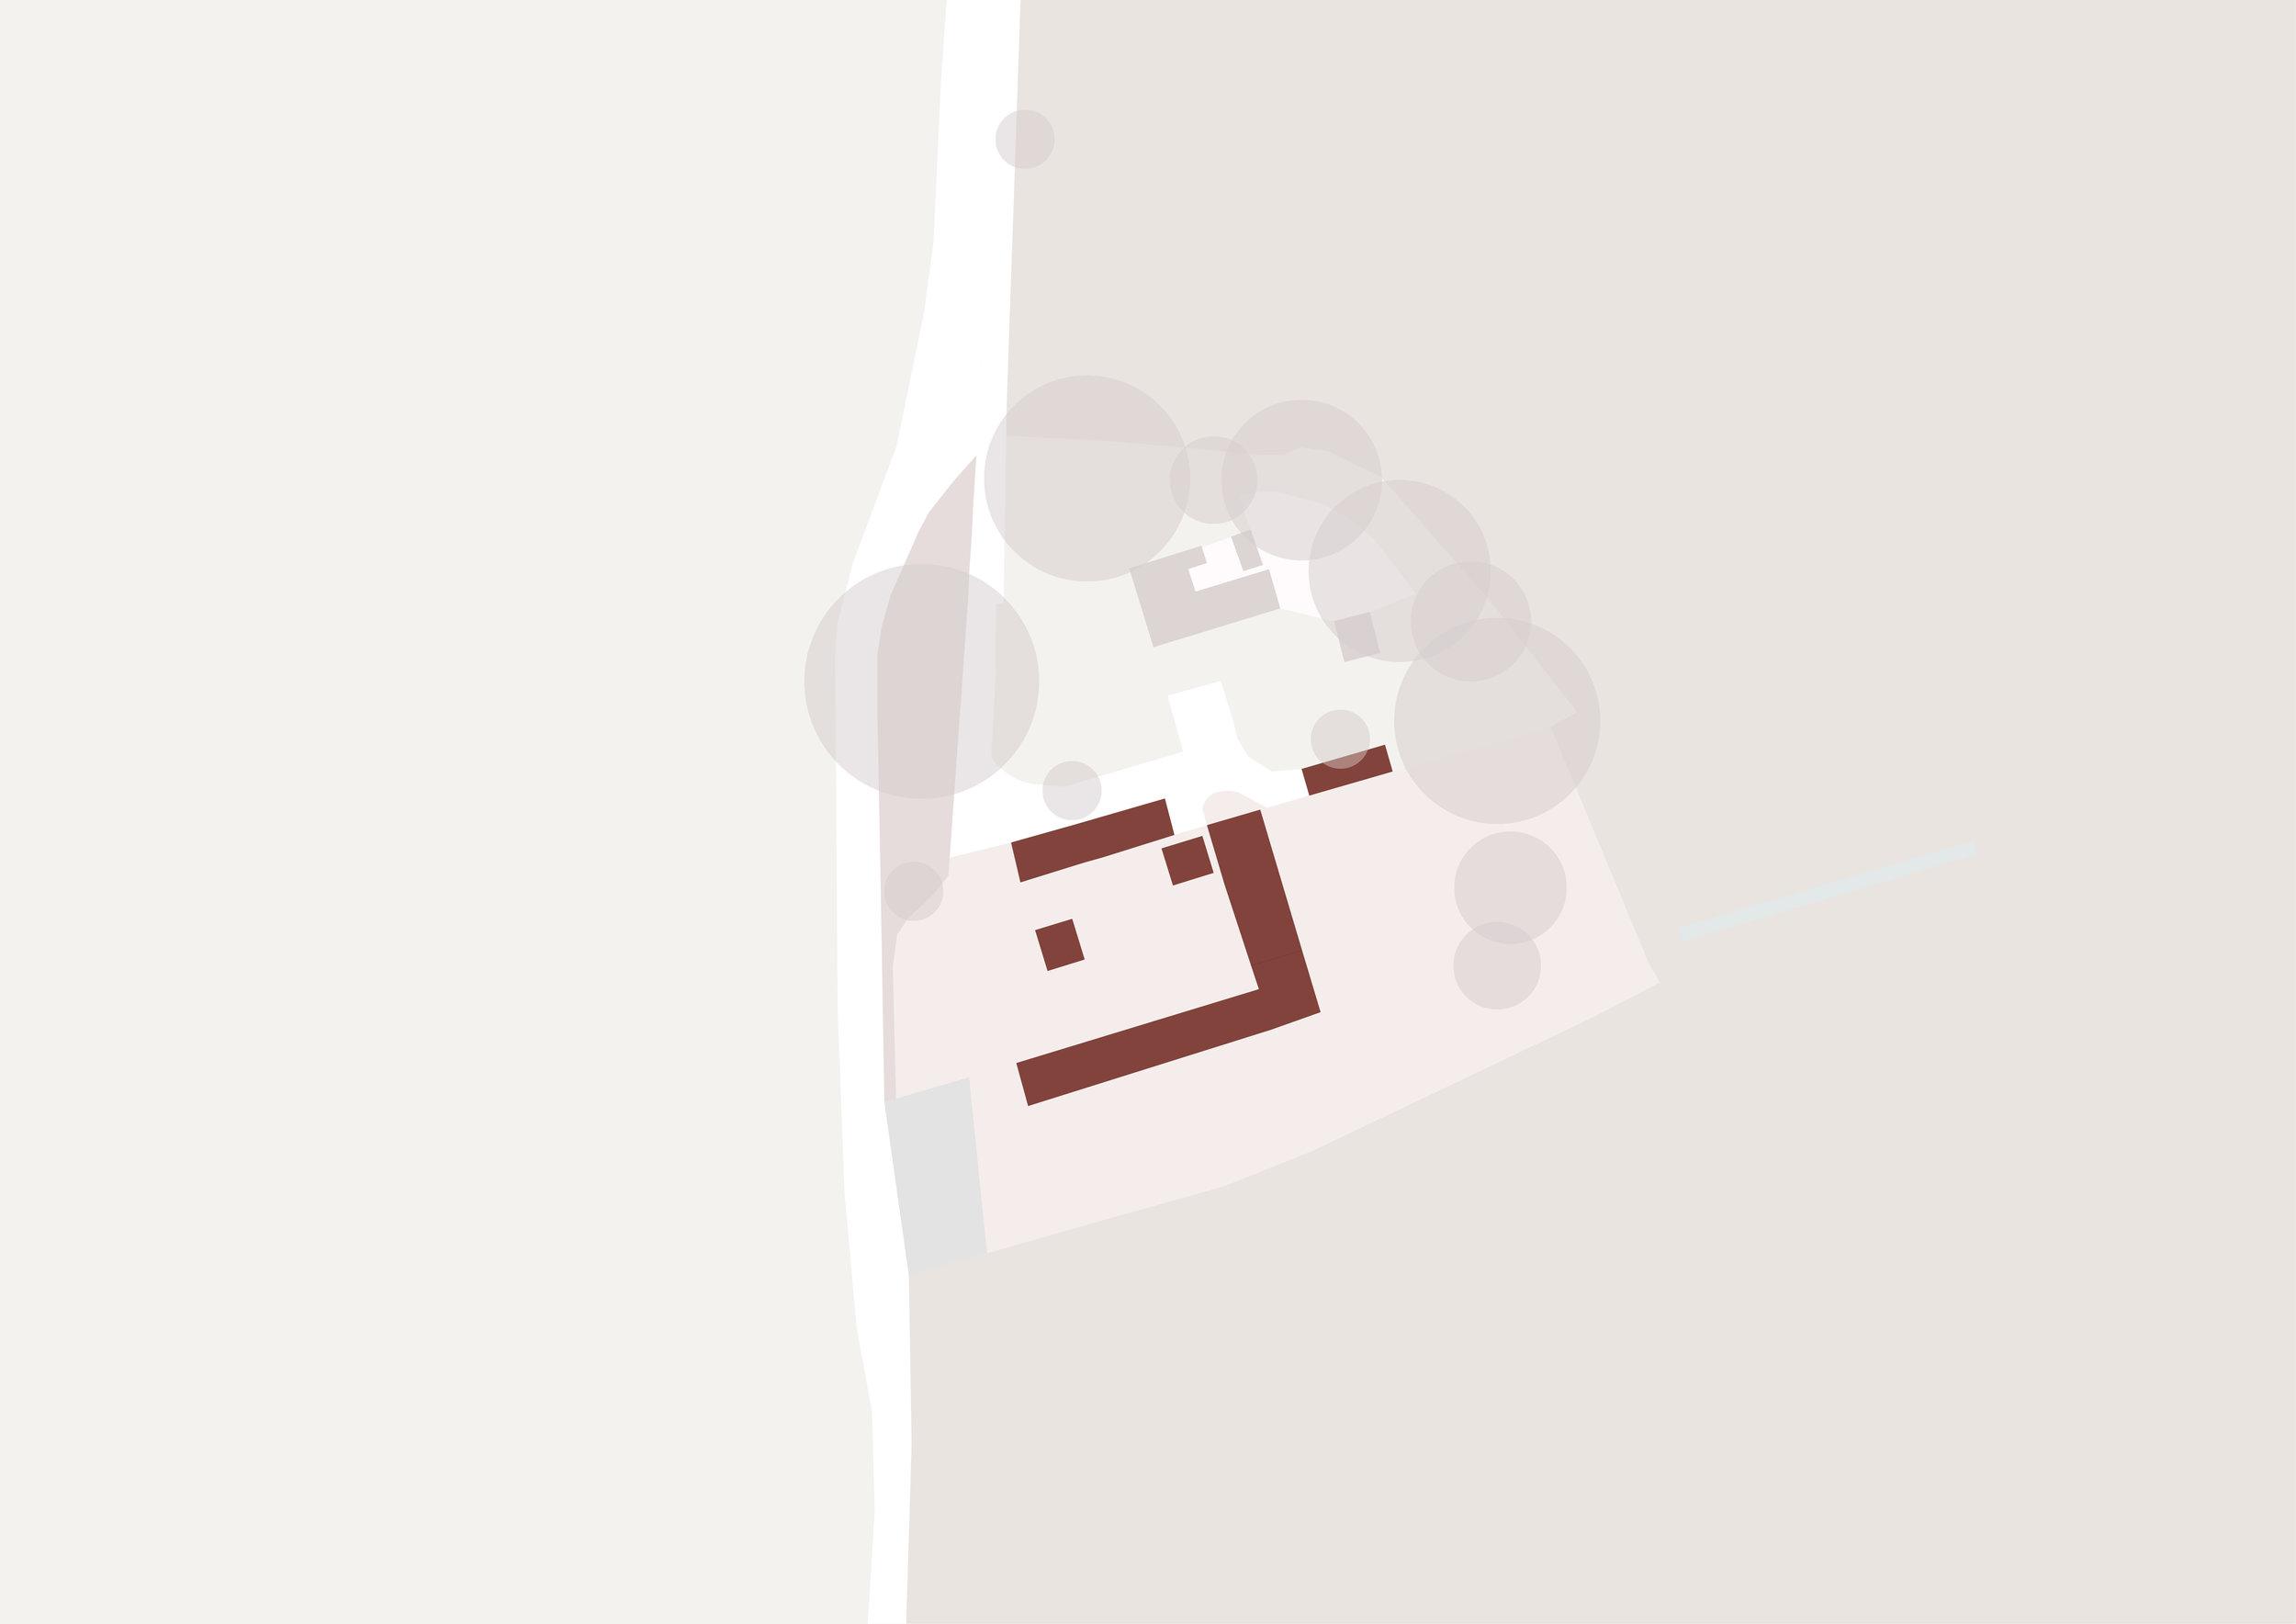 Brecks Farm Map - York Architects - Samuel Kendall Associates